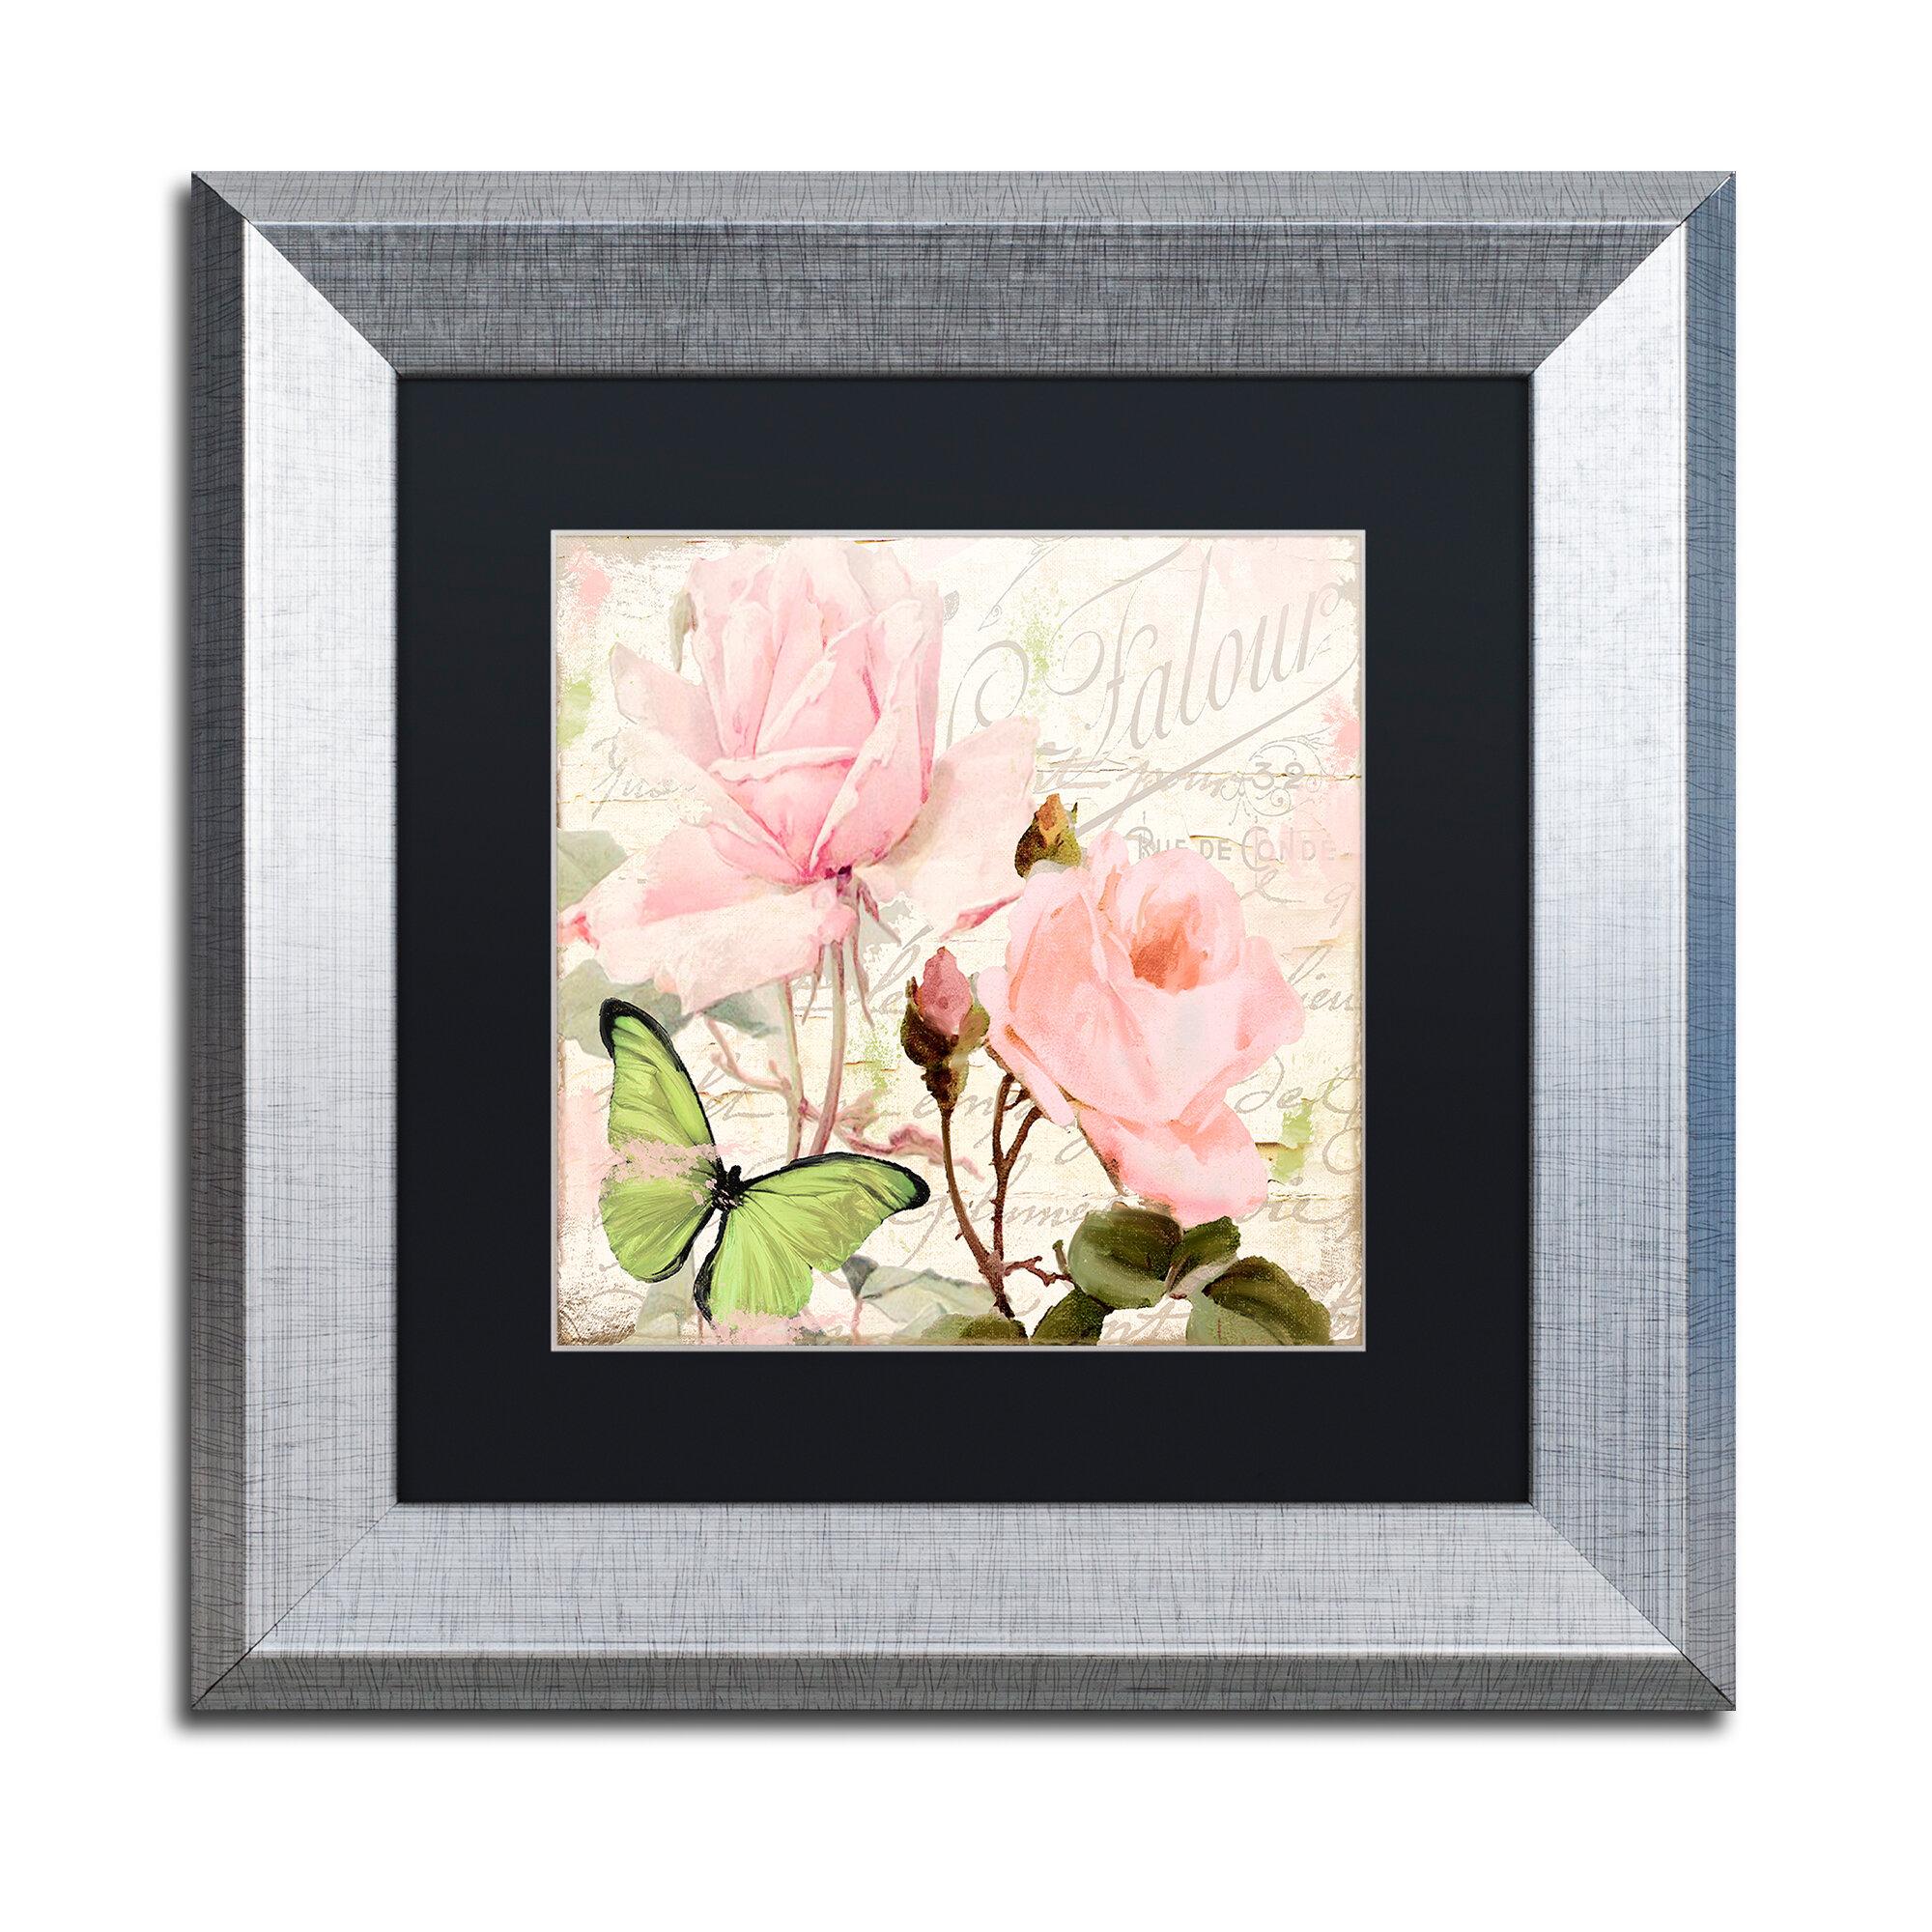 Trademark art 39 florabella iii 39 framed graphic art wayfair for Bella flora chaise lounge